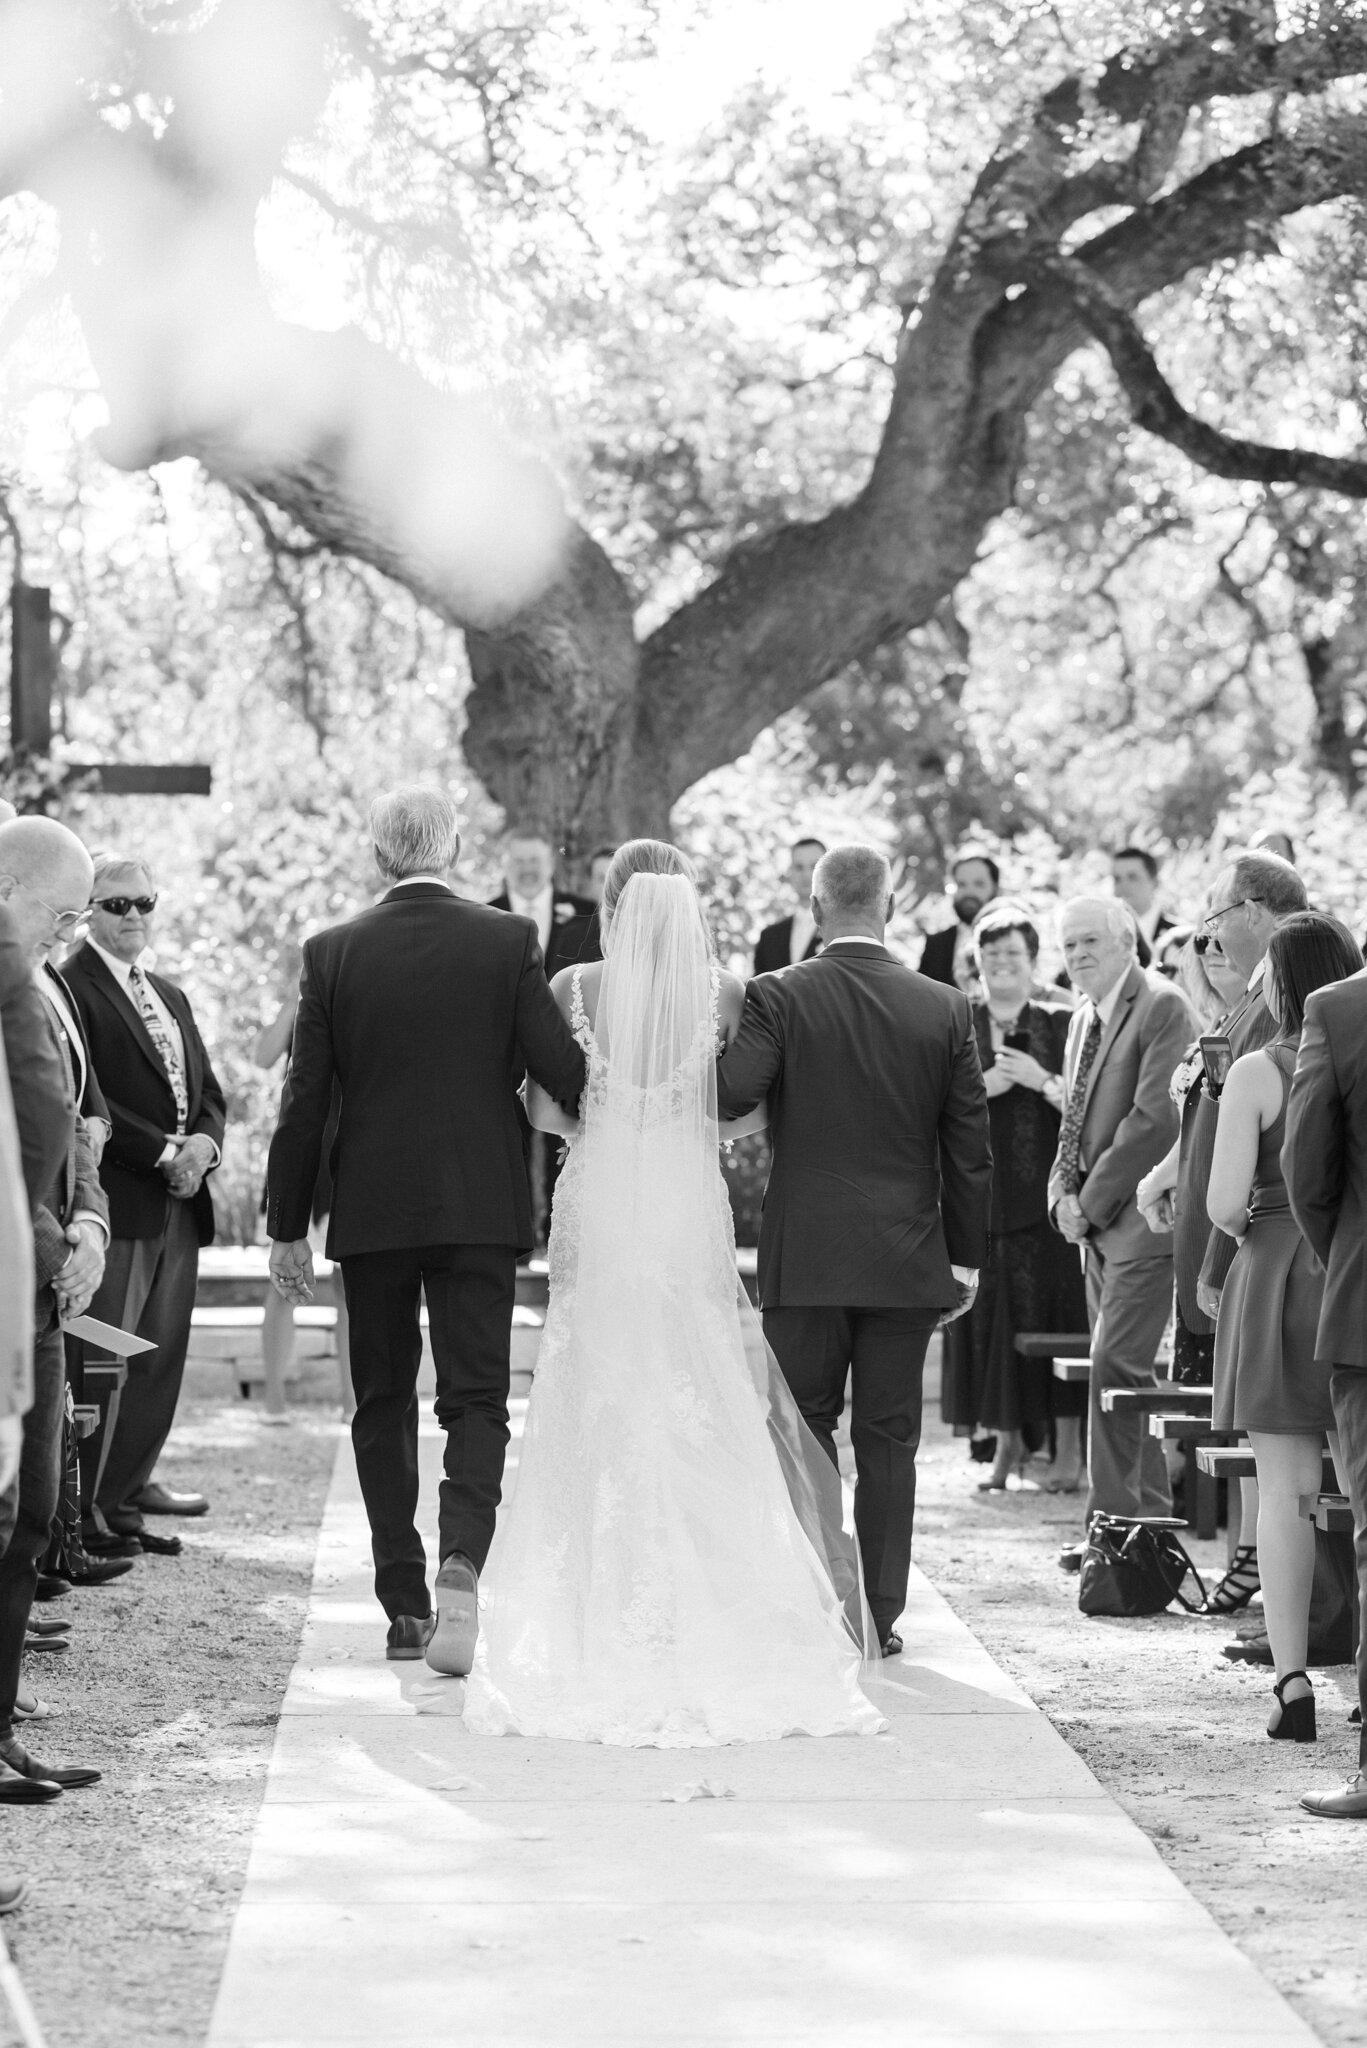 San Antonio Austin Boerne New Braunfels Spring Branch Texas Wedding Engagement Photographer Photography Hill Country Texas Park 31 Wedding Summer Wedding Pink Navy Gold Elegant Chic Wedding San Antonio Austin Texas photographer 43